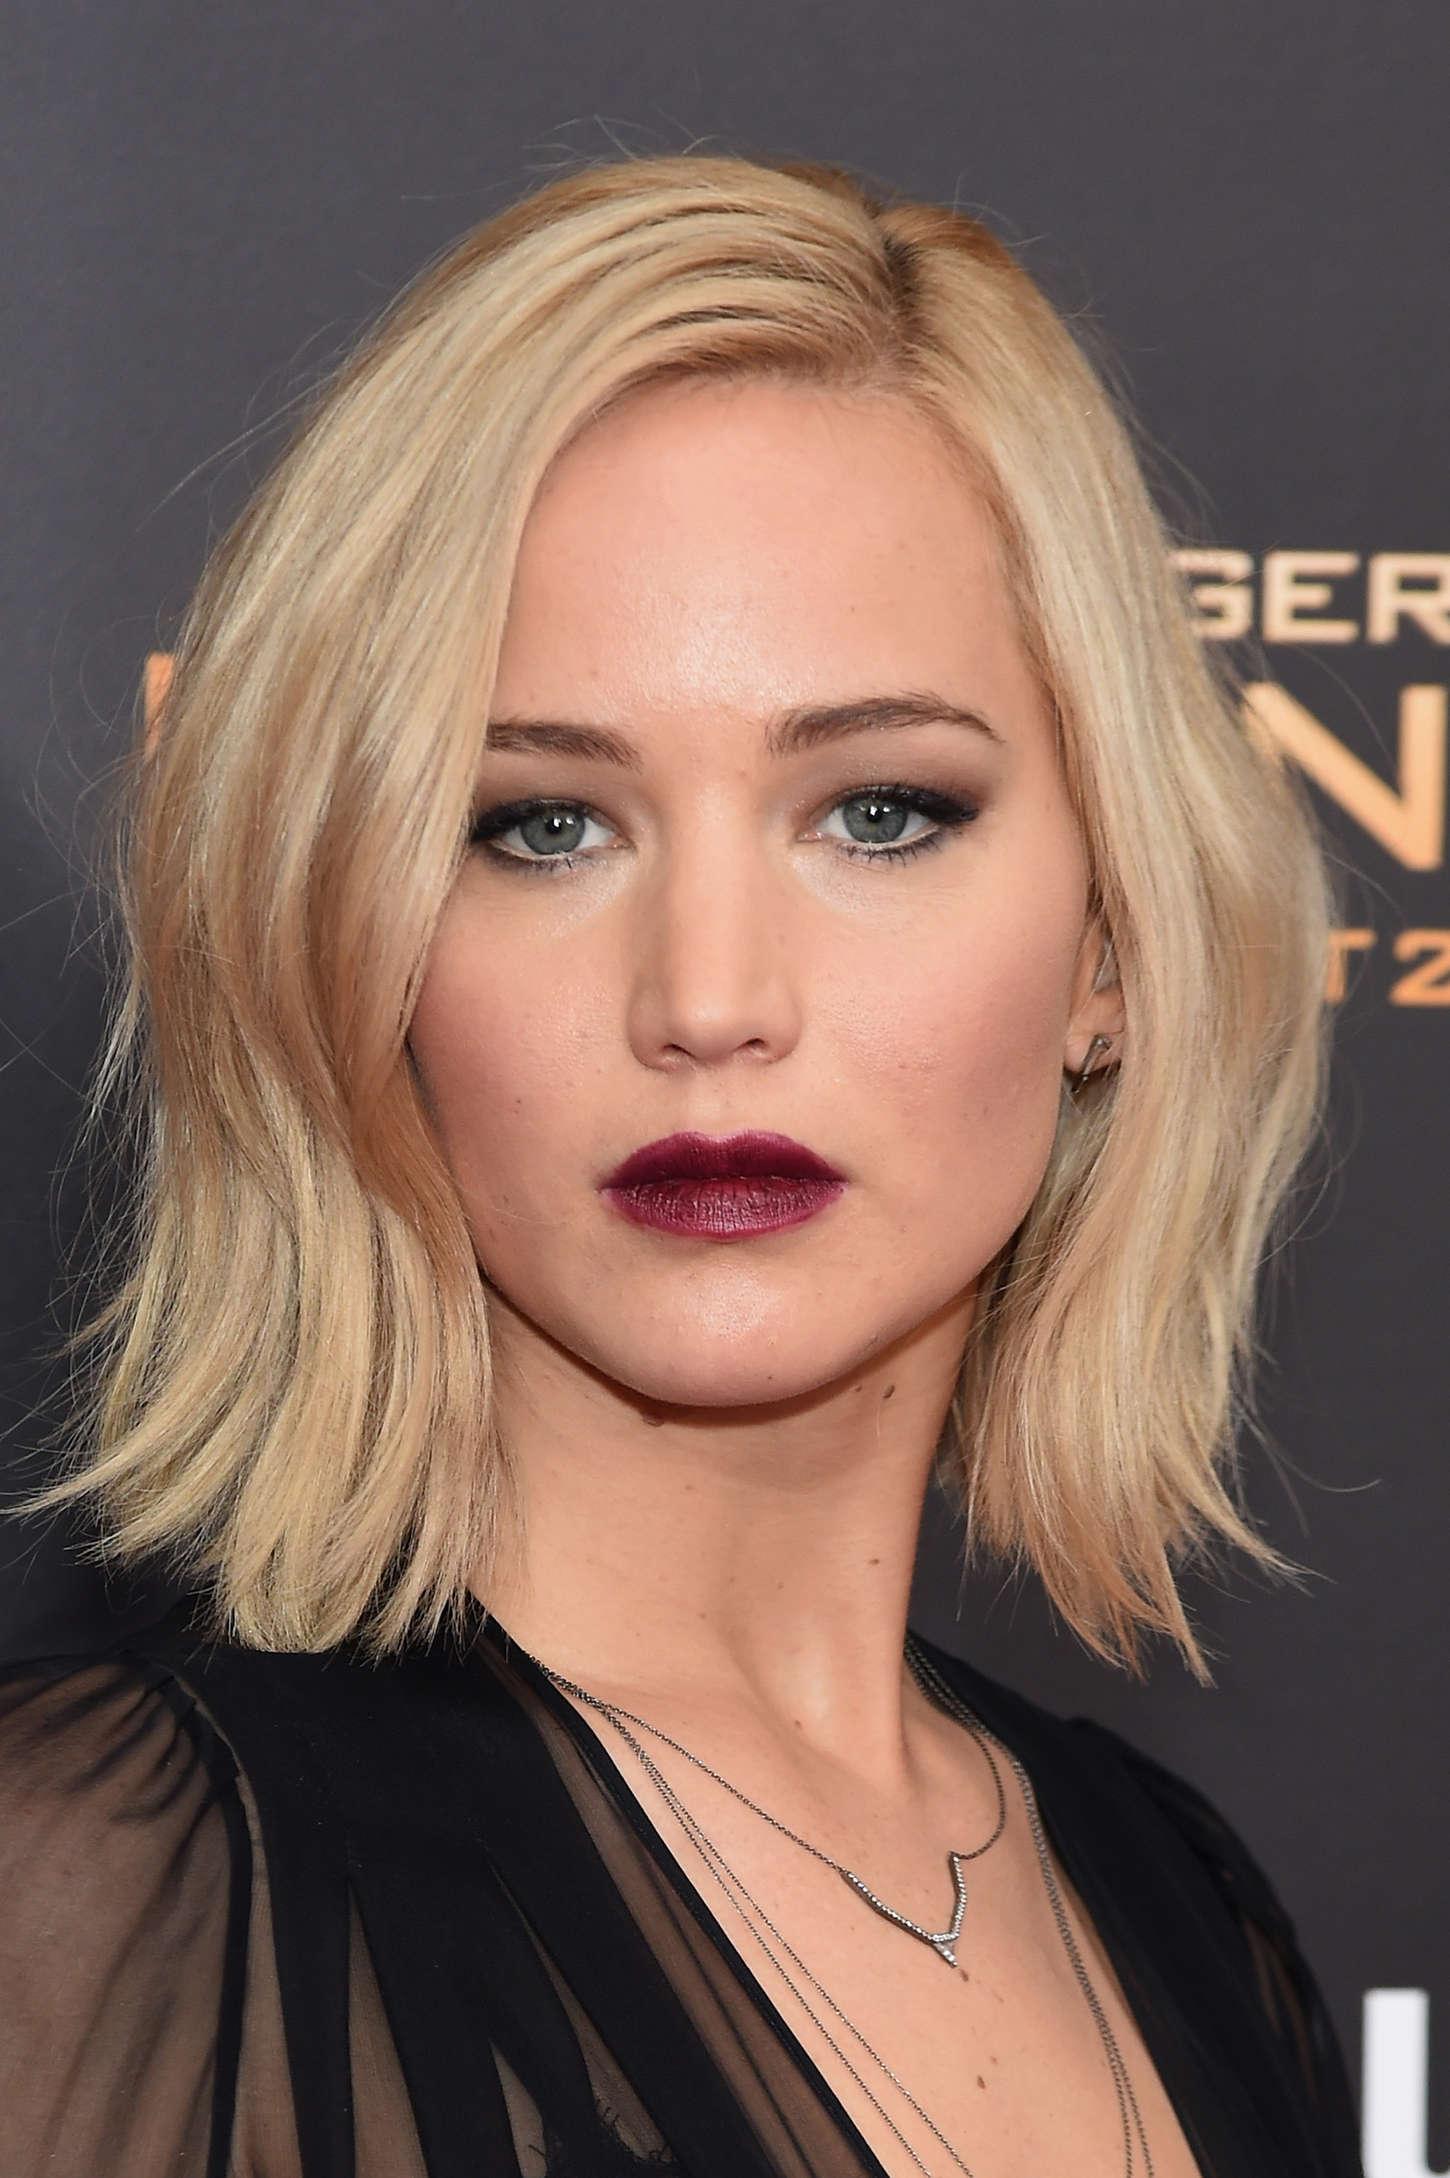 Jennifer-Lawrence--The-Hunger-Games-Mockingjay-Part-2-NY-Premiere--18